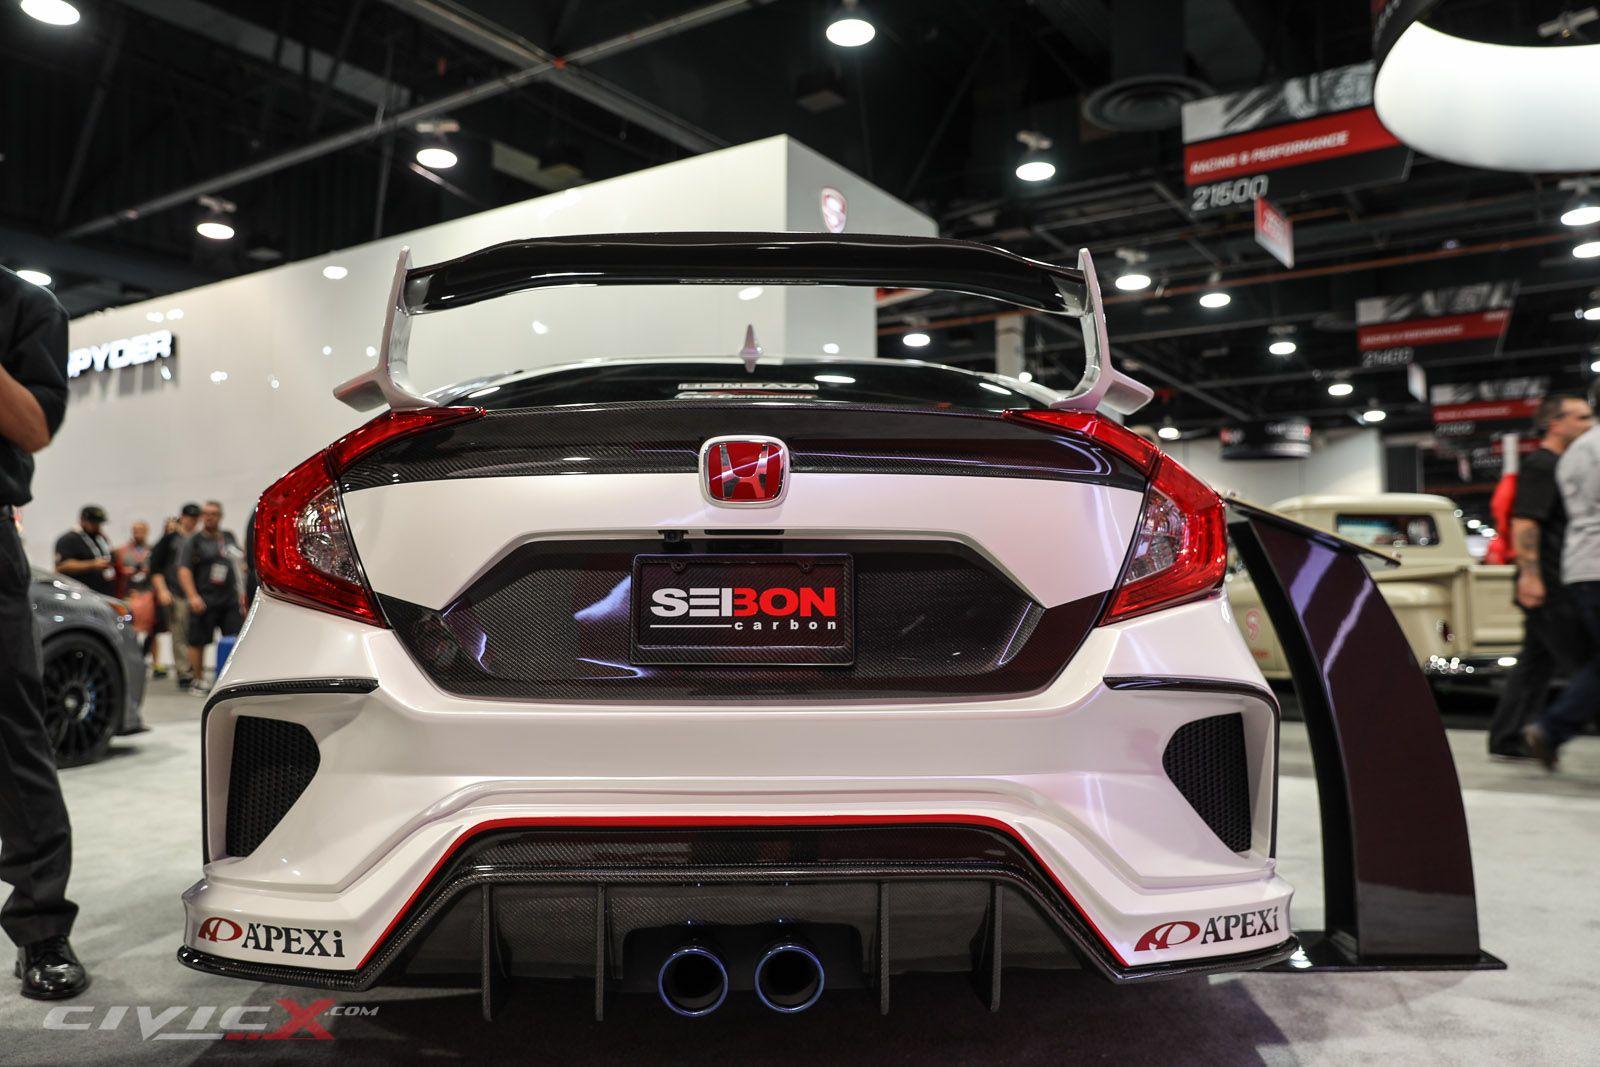 SEMA 2016 Honda Civics (Part 1 of 2) Seibon Carbon